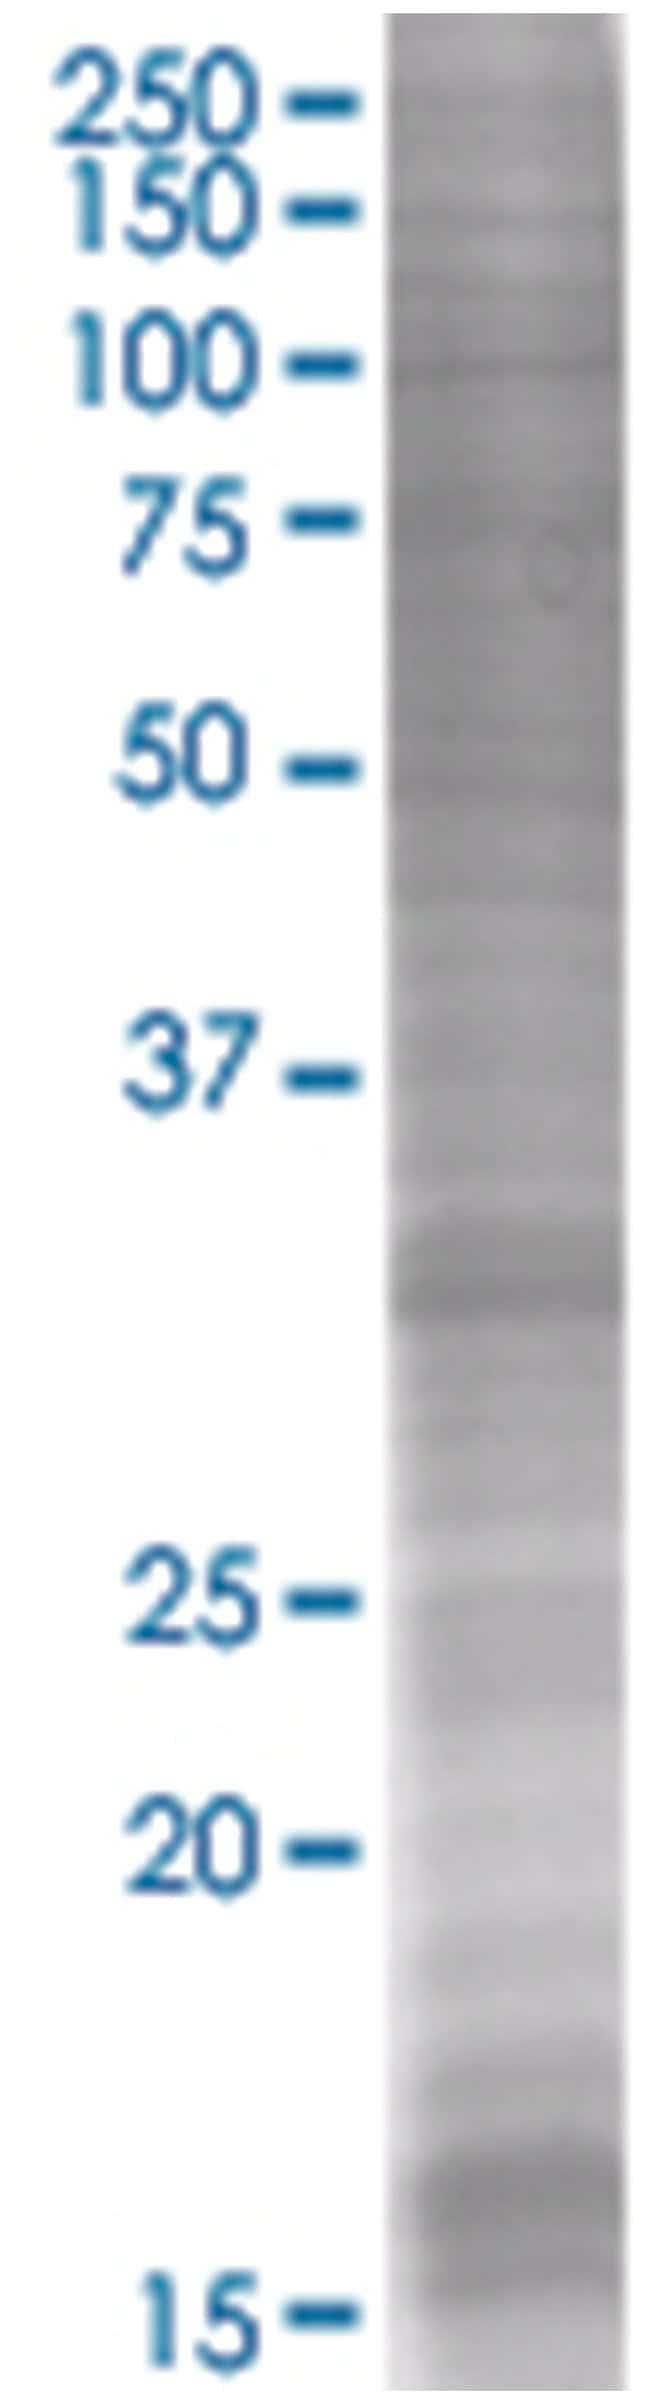 PDYN 293T Cell Overexpression Lysate (Denatured), Abnova 100µL:Life